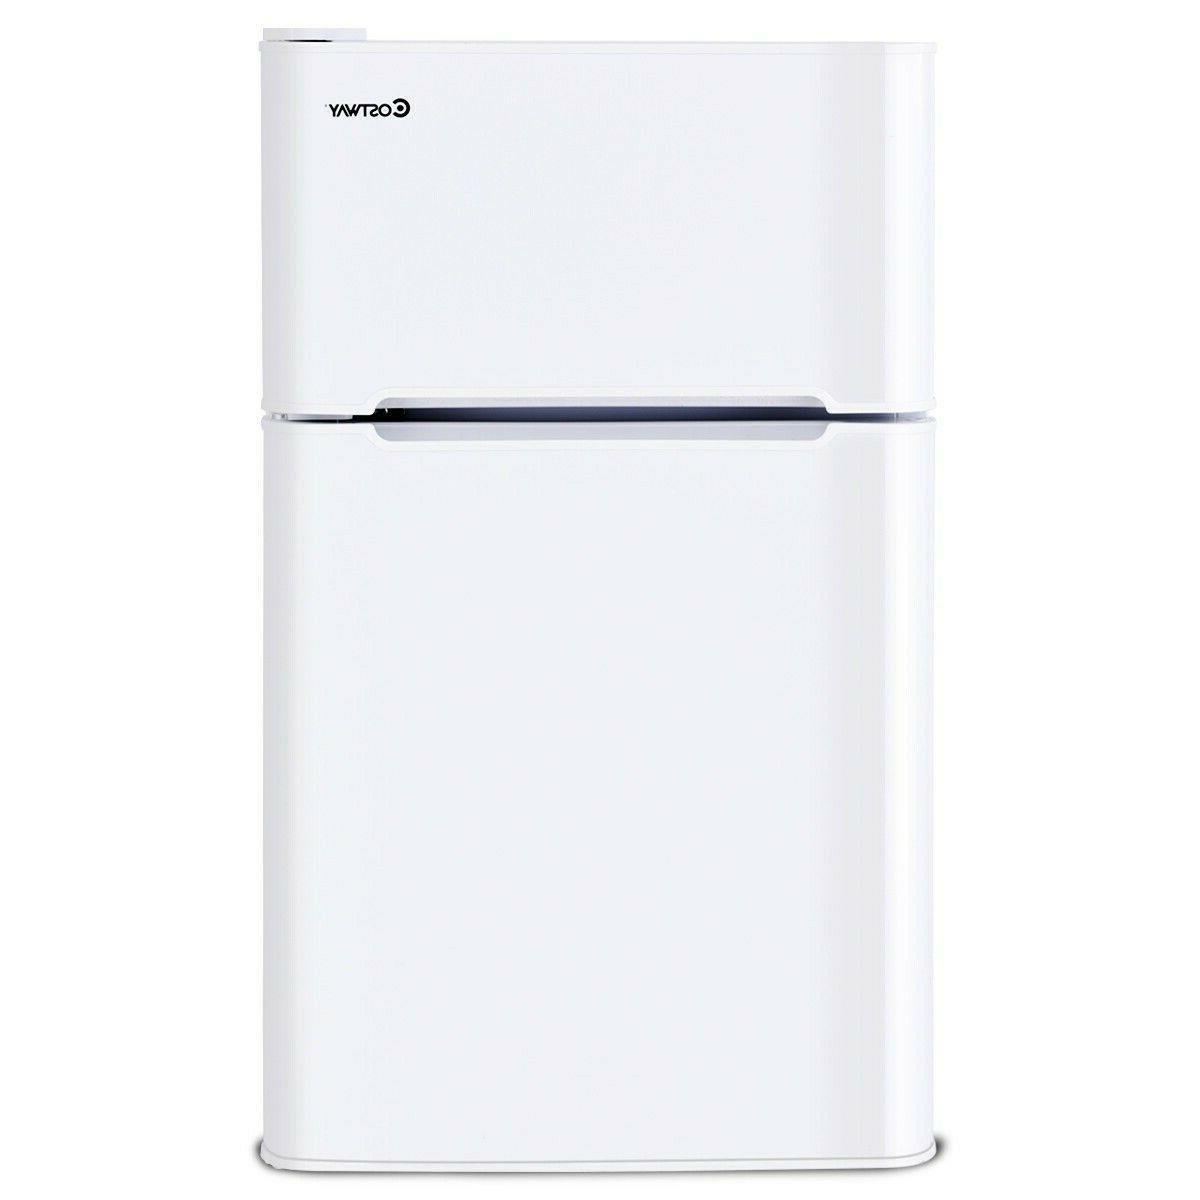 White Refrigerator Refrigerators With Freezer Apartment